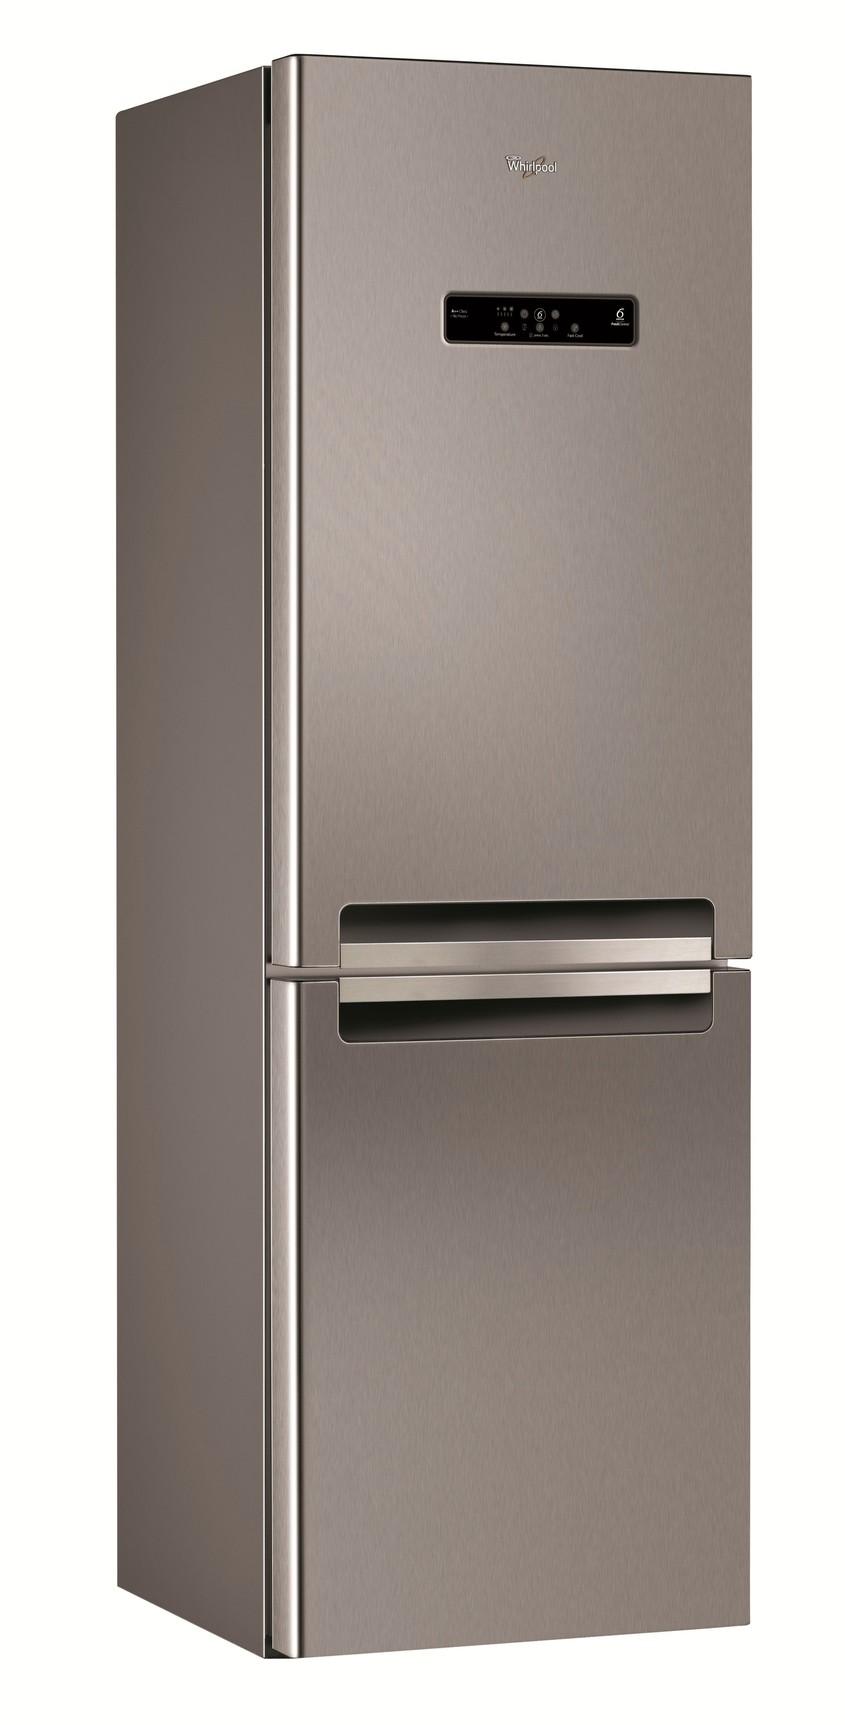 WHIRLPOOL ABSOLUTE - Combinele frigorifice WHIRLPOOL ABSOLUTE